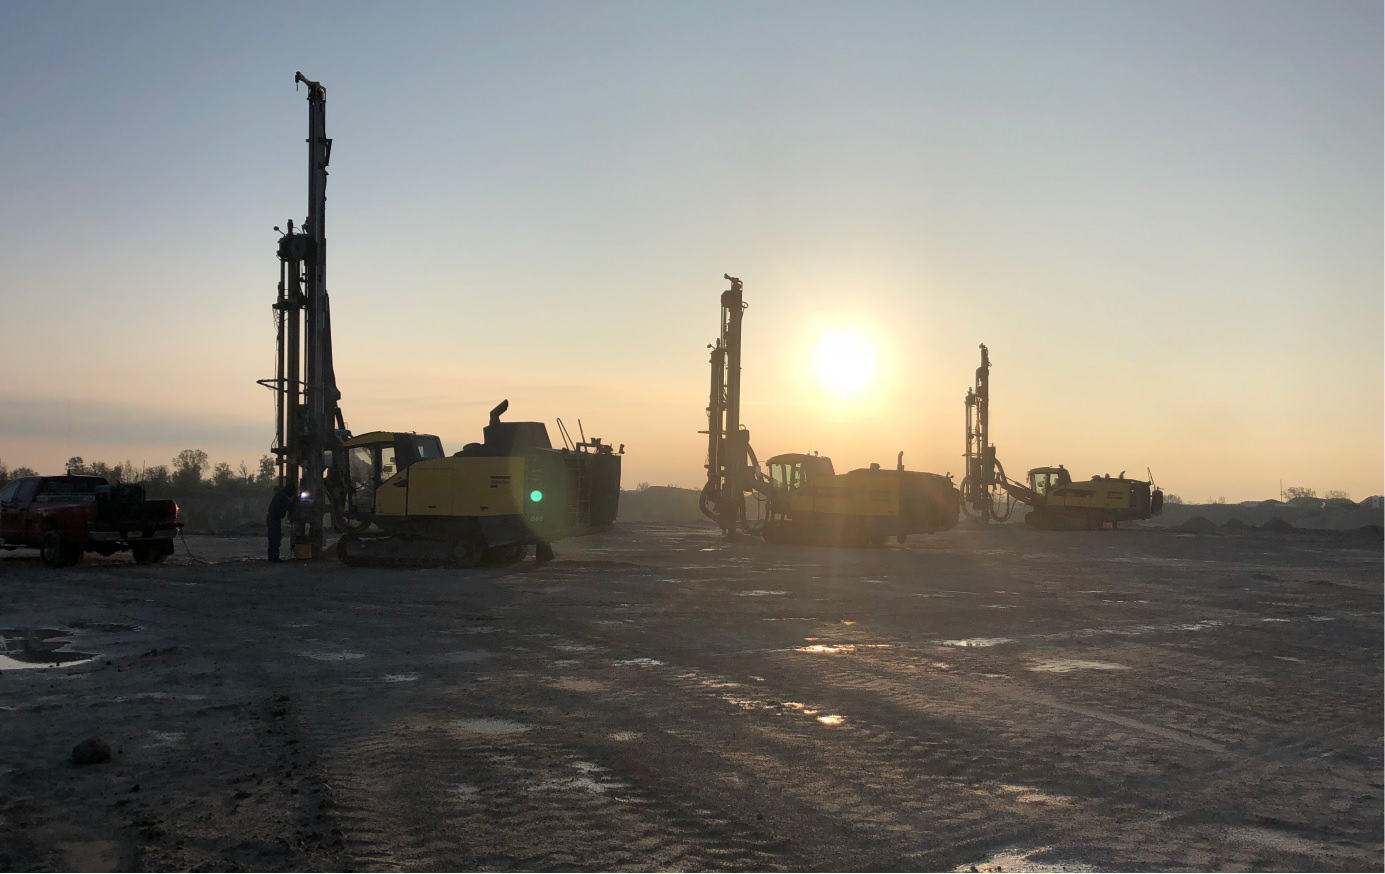 Three drill rigs at work